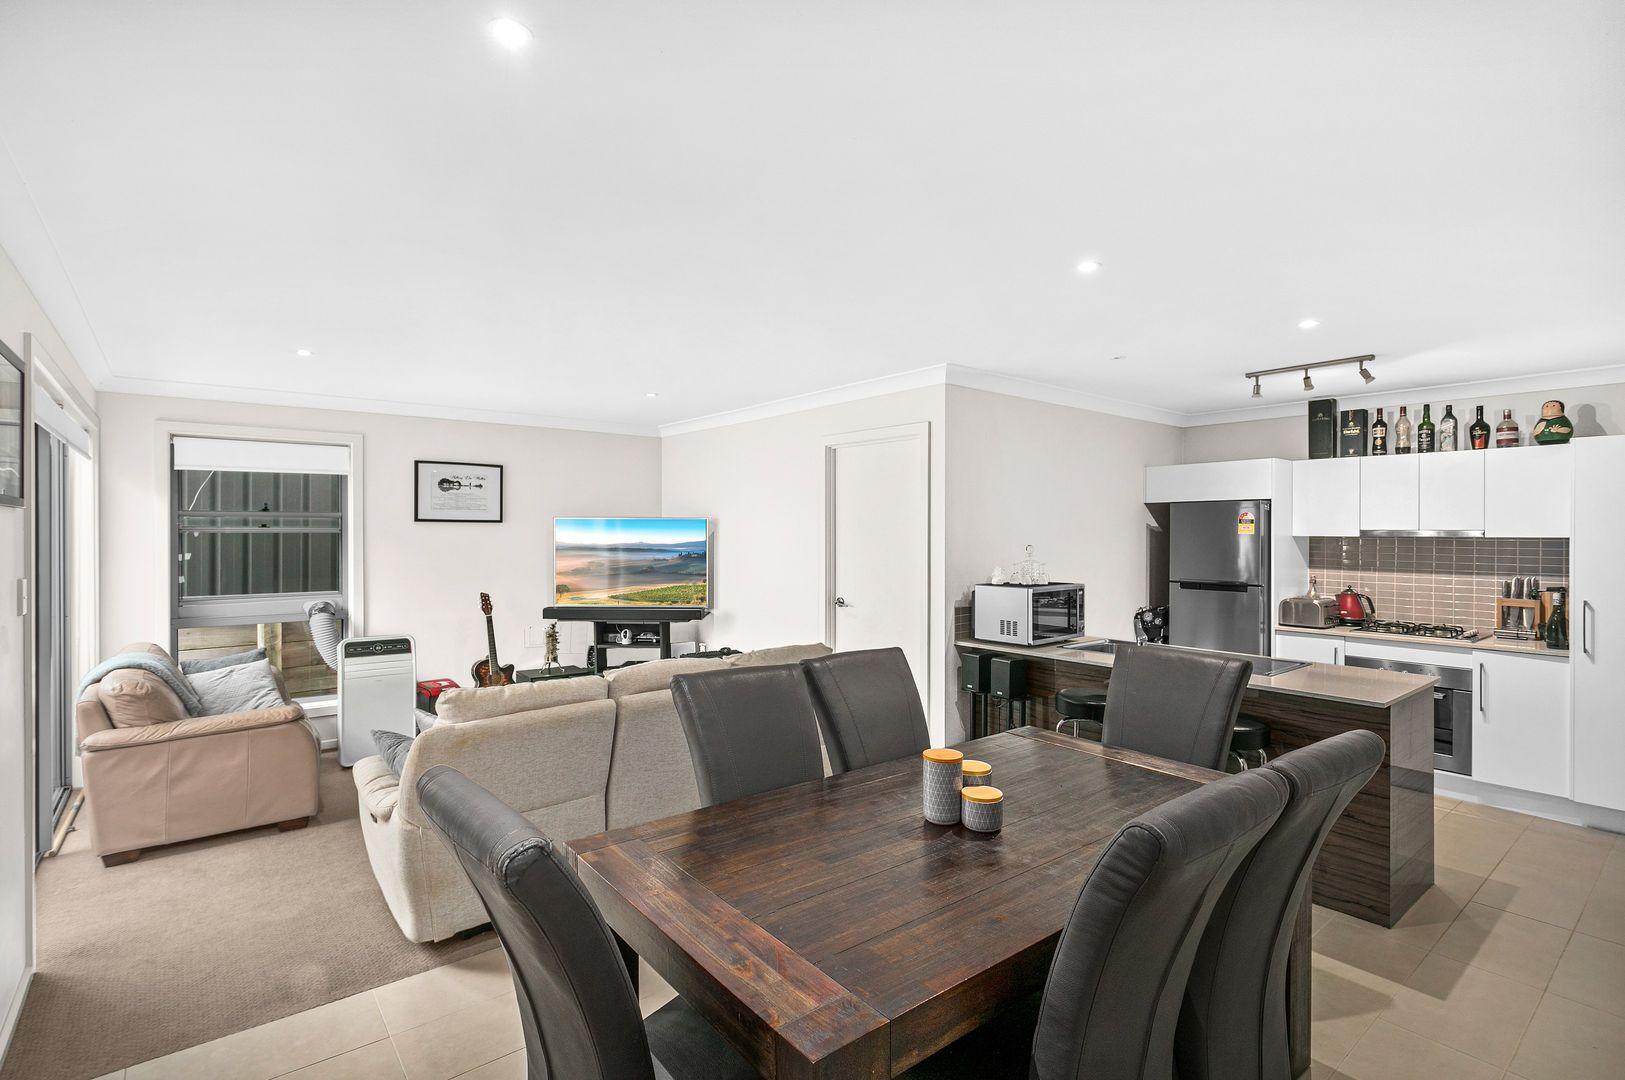 6 Jemima Close, Flinders NSW 2529, Image 2